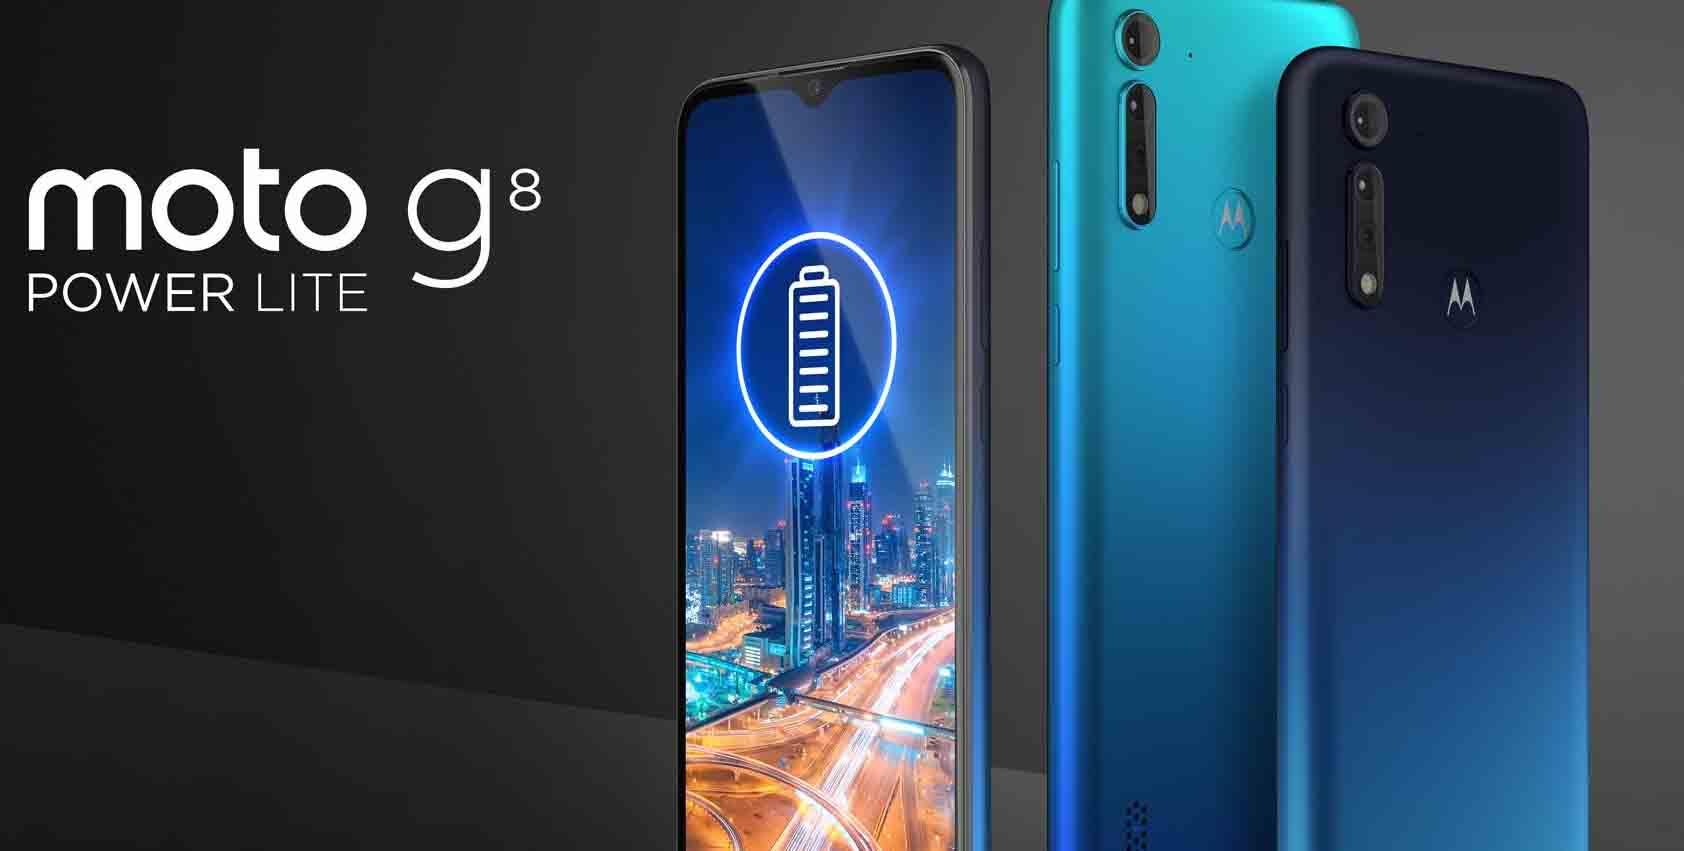 Photo of Motorola Moto G8 Power Lite – Full Phone's Price & Specifications